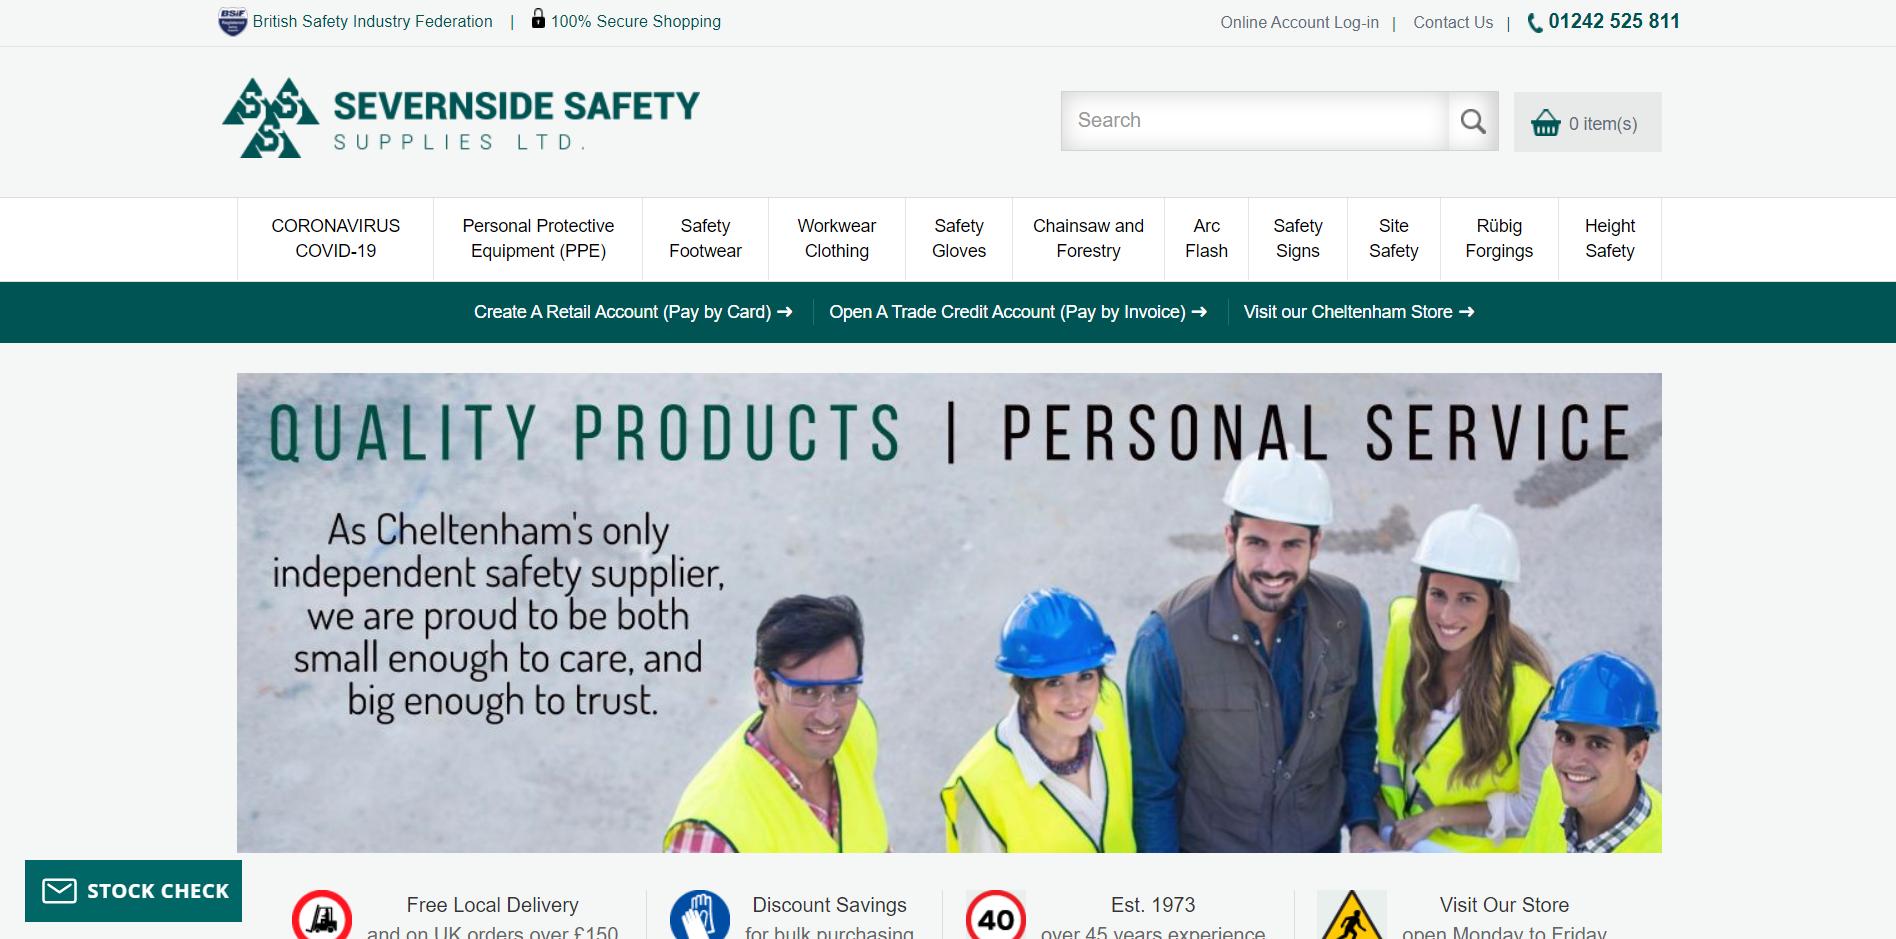 Severnside Safety